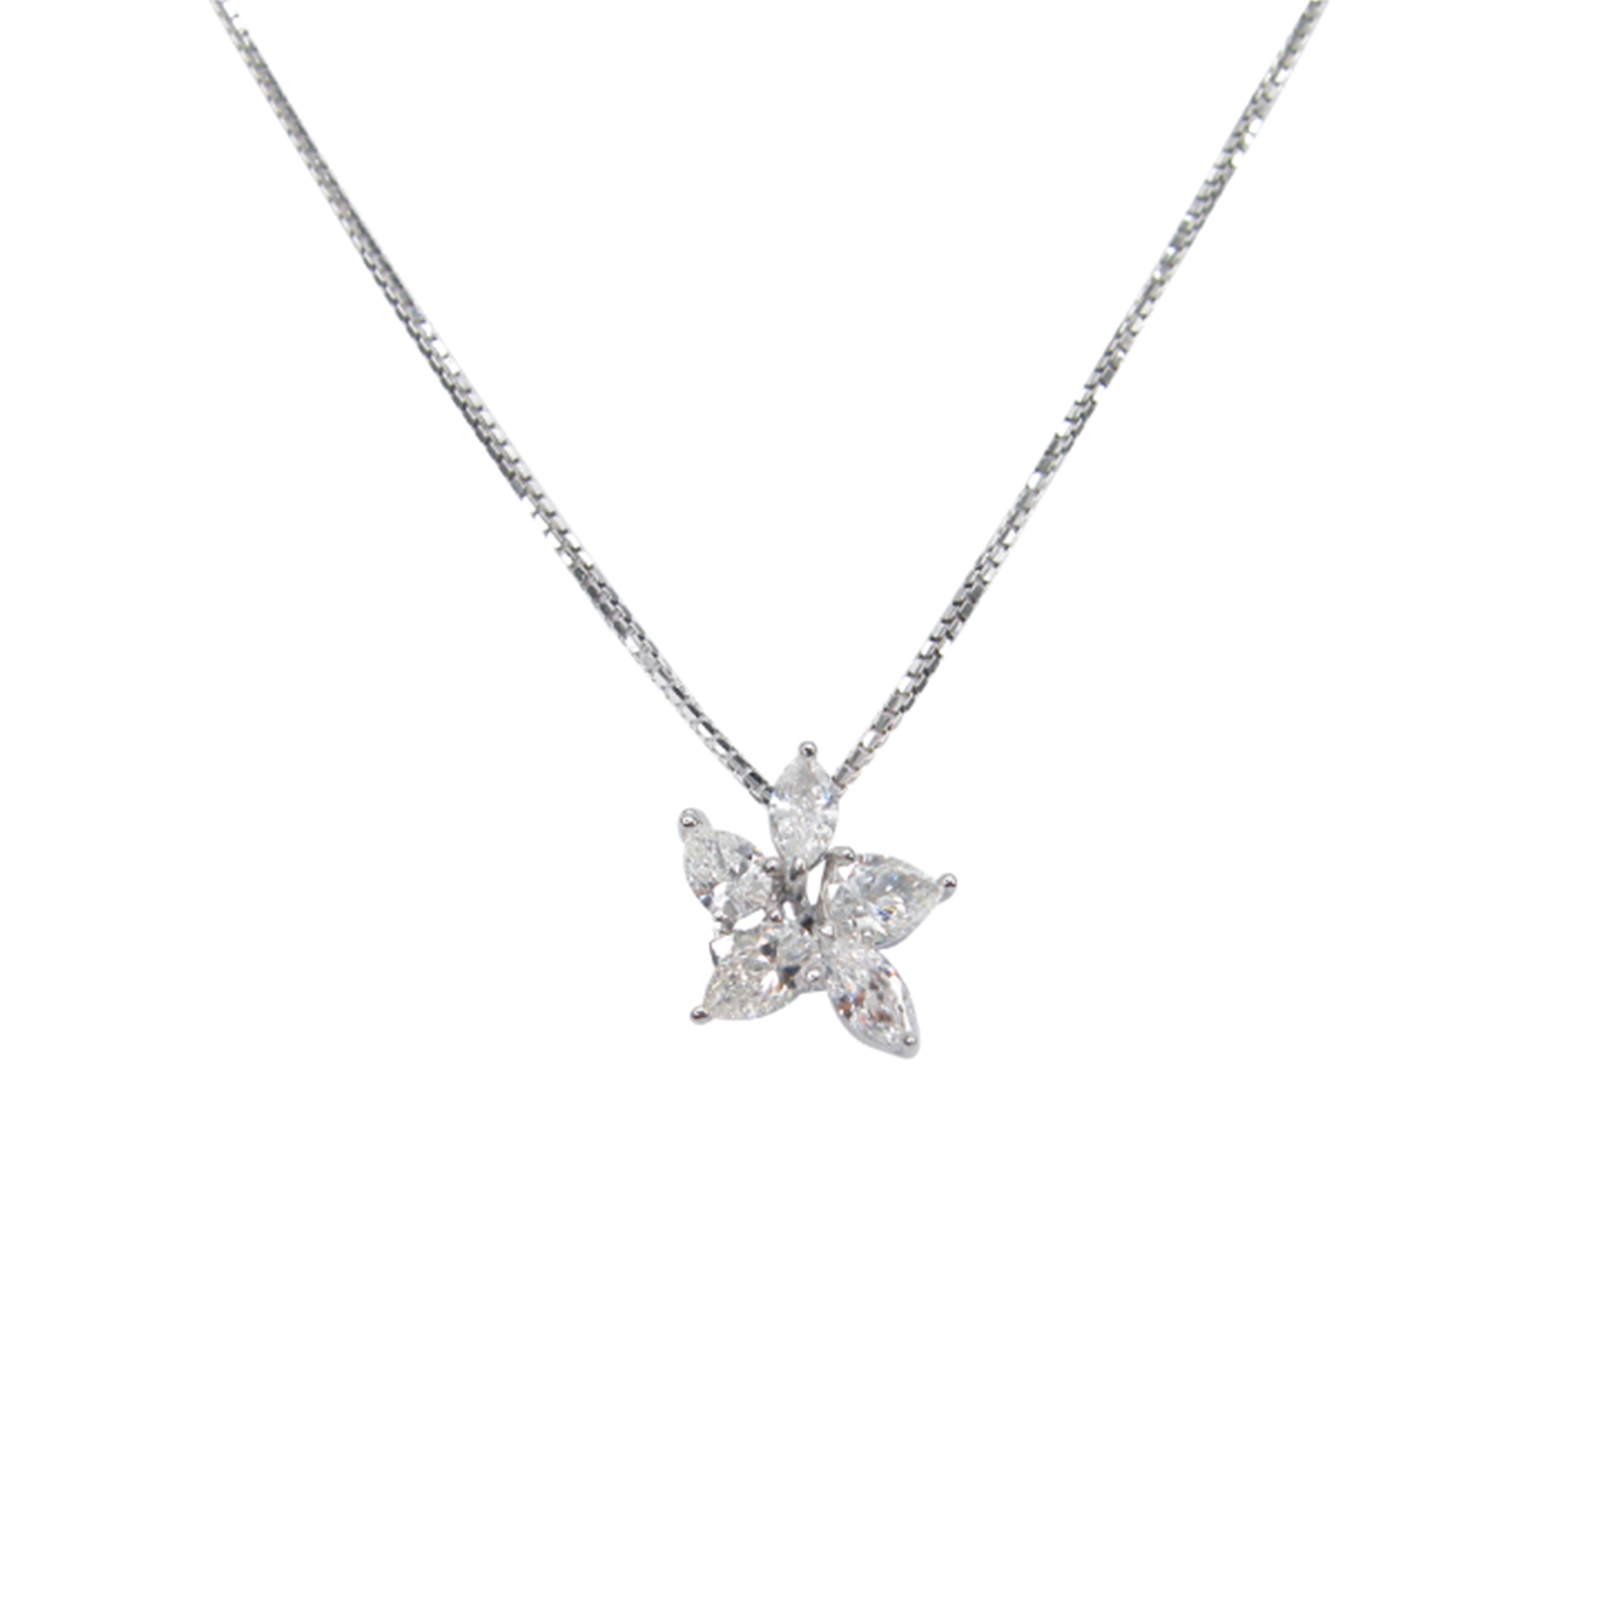 CLUSTER DIAMOND PENDANT BESPOKE FINE JEWELLERY BY SHAHINA HATTA